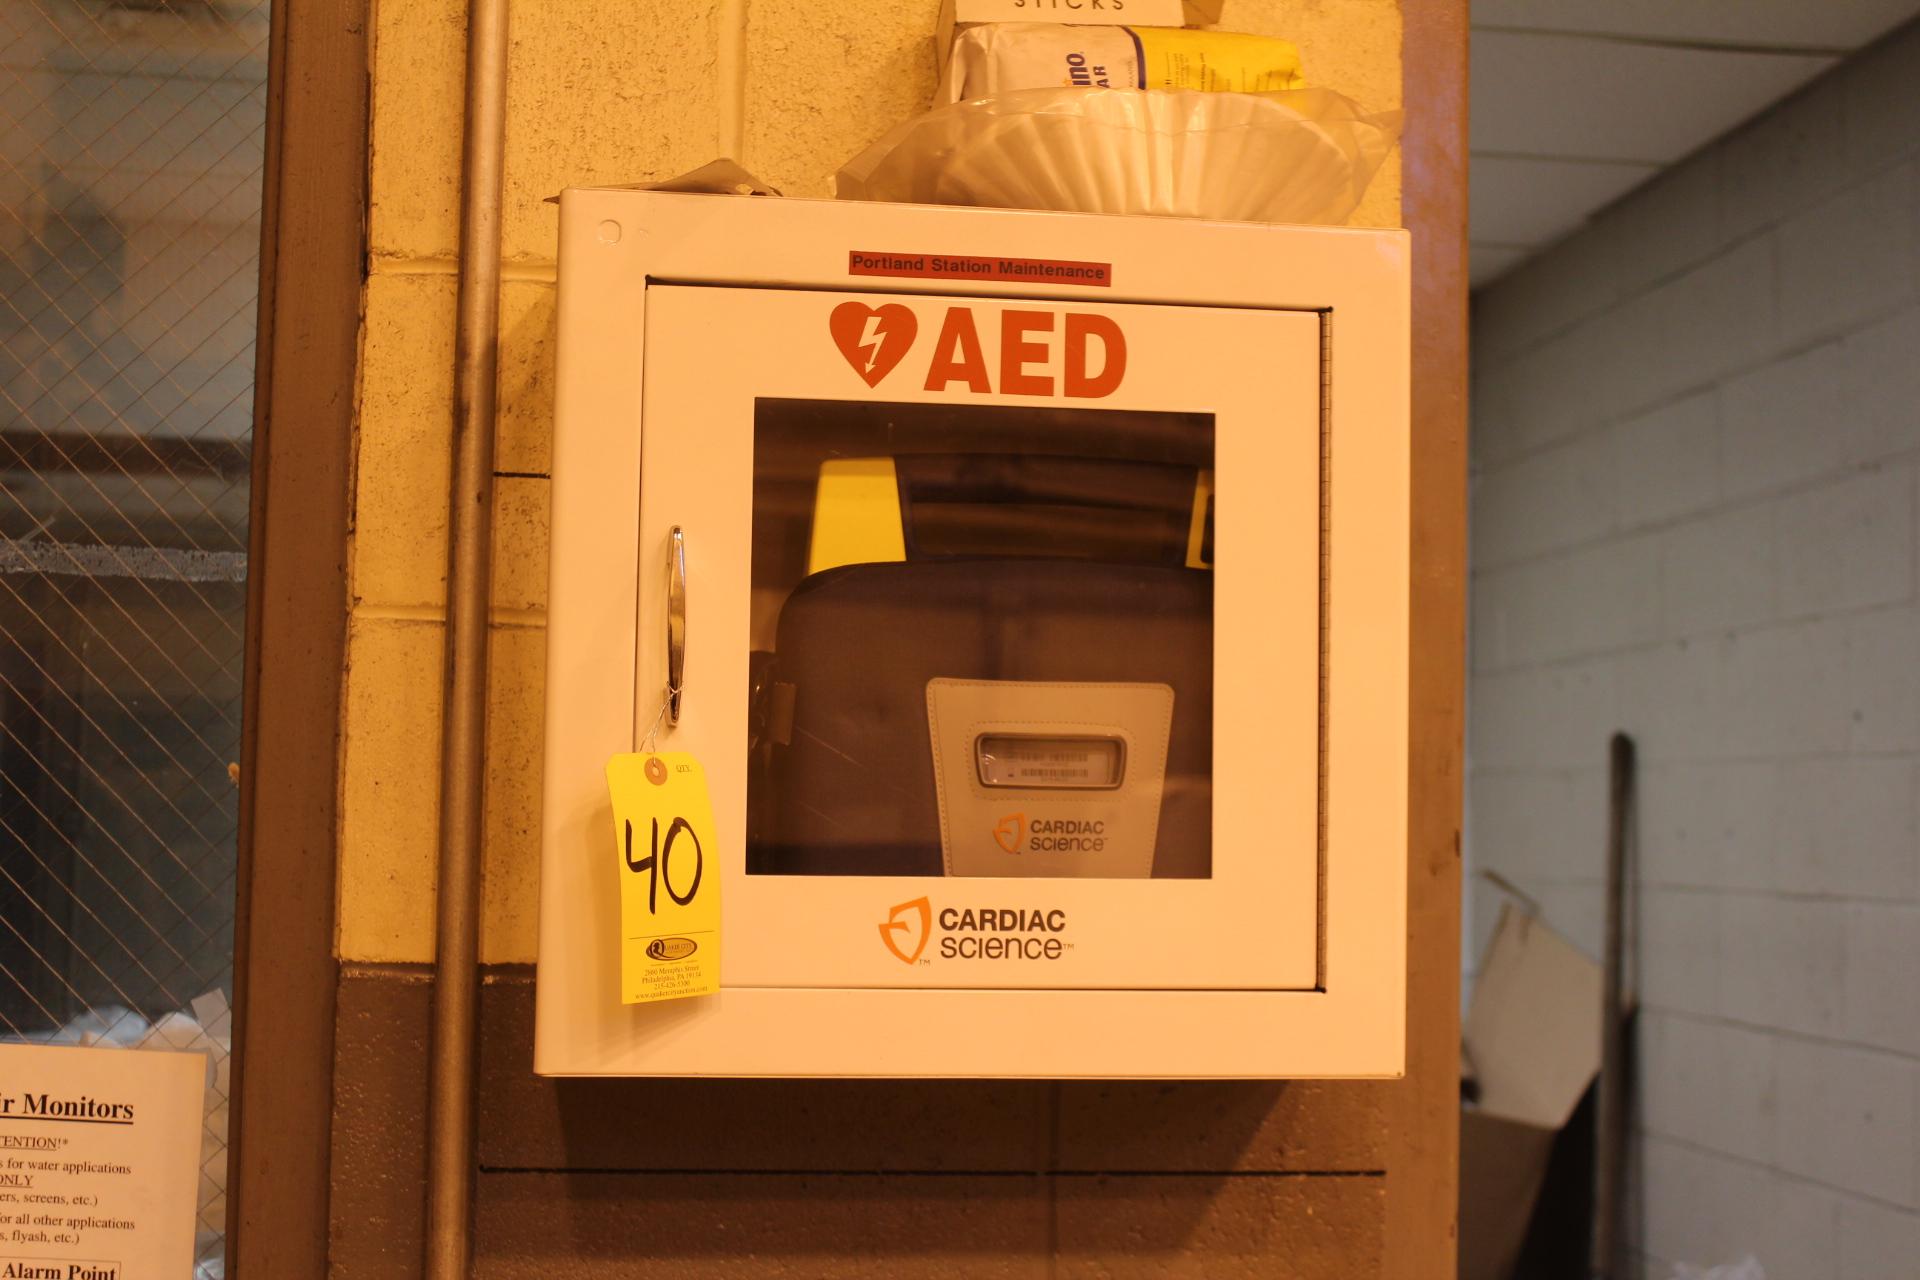 CARDIAC SCIENCE AED DEFIBRILLATOR W/ CABINET